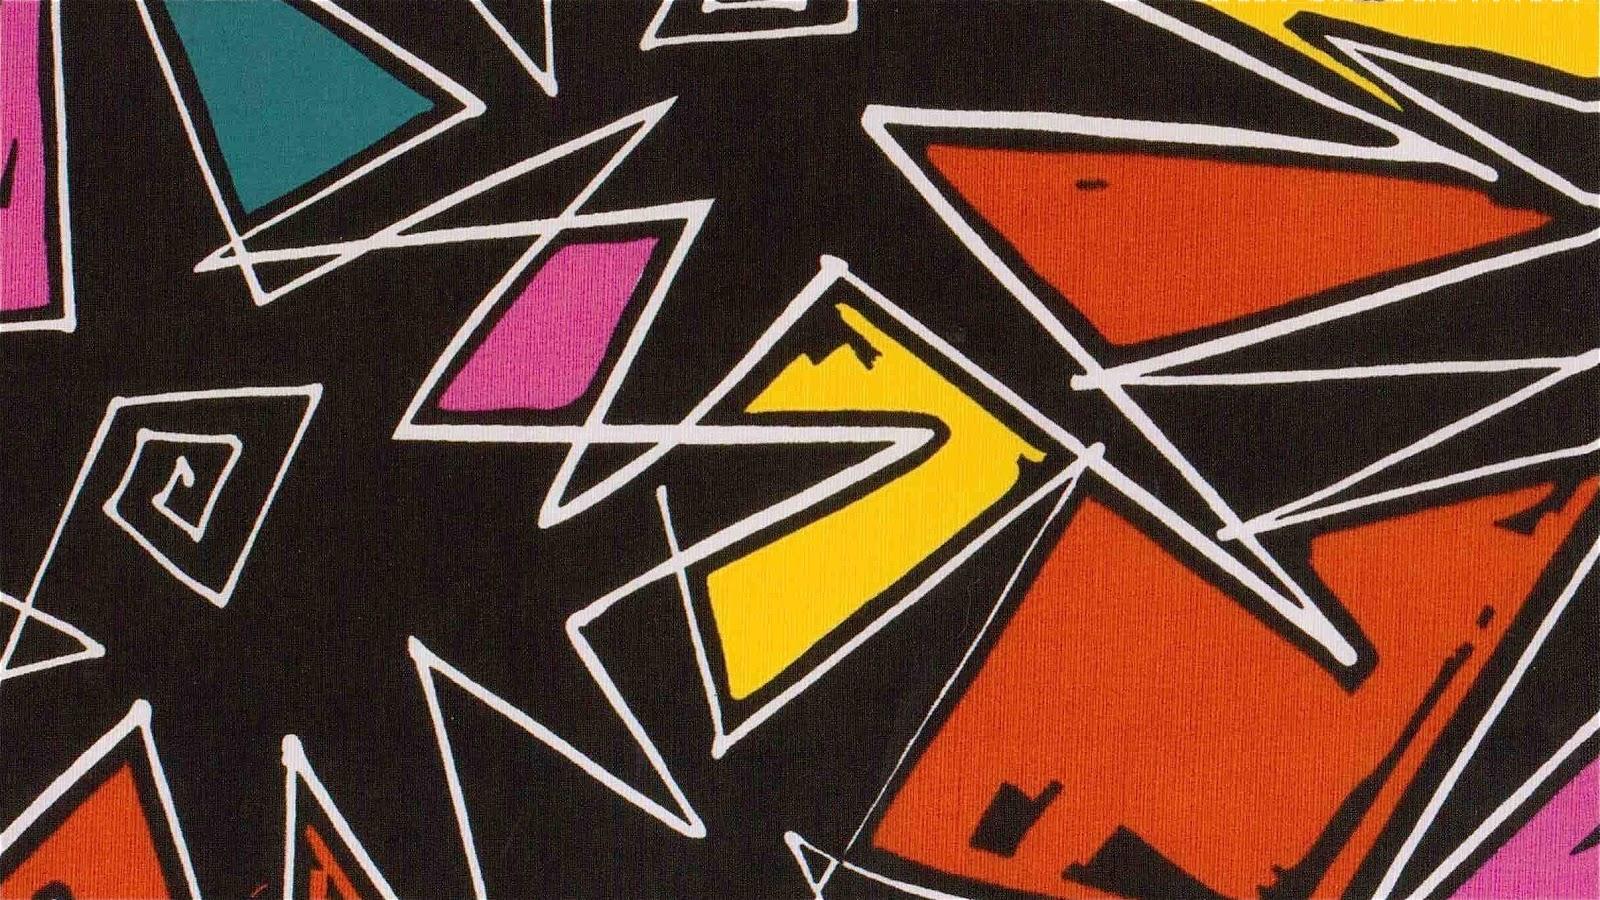 80s Wallpaper Designs Print design pow 1600x900